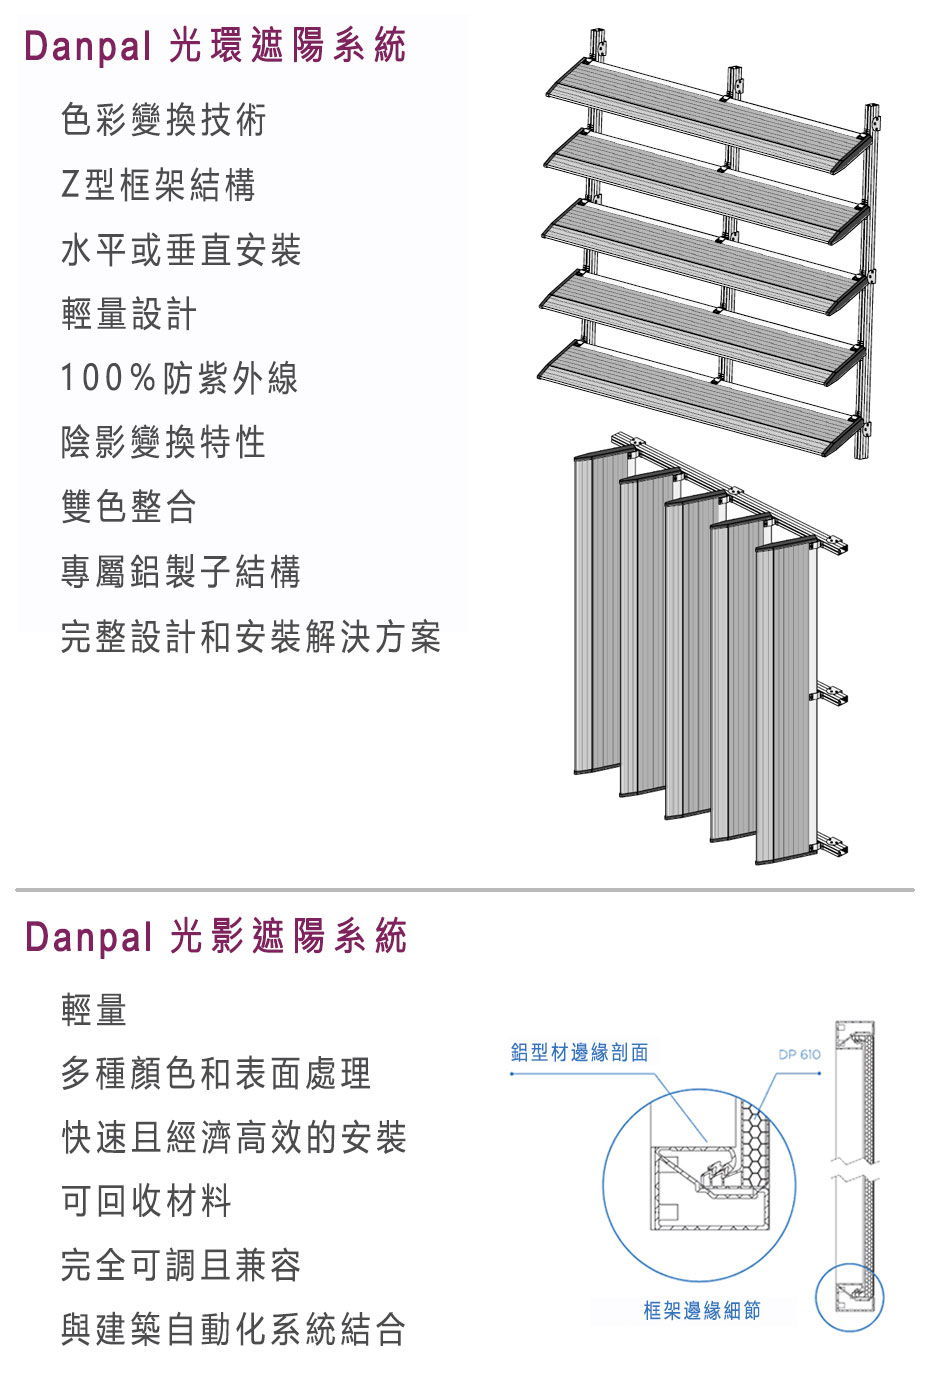 DanpaShade-System-Options-Image-Rev_02.ch